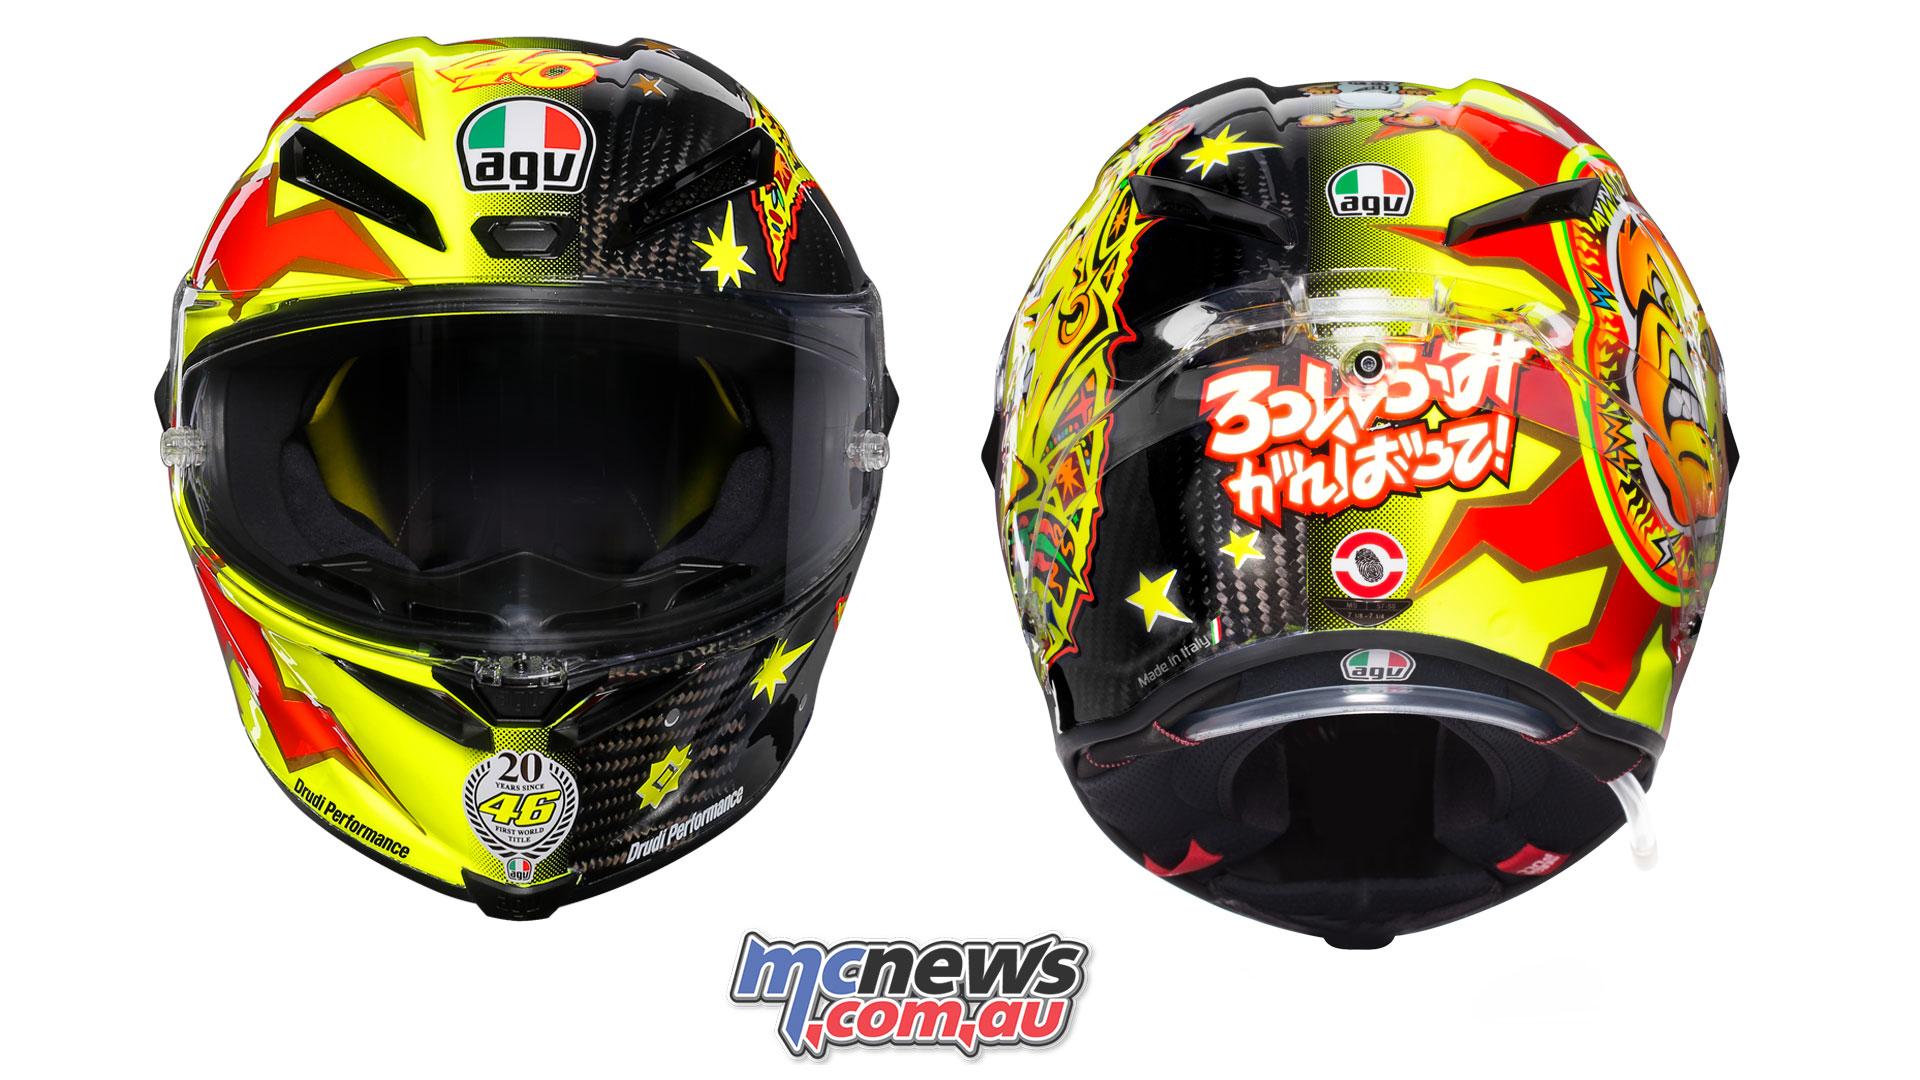 AGV Pista GP R SoleLunal LE Helmet